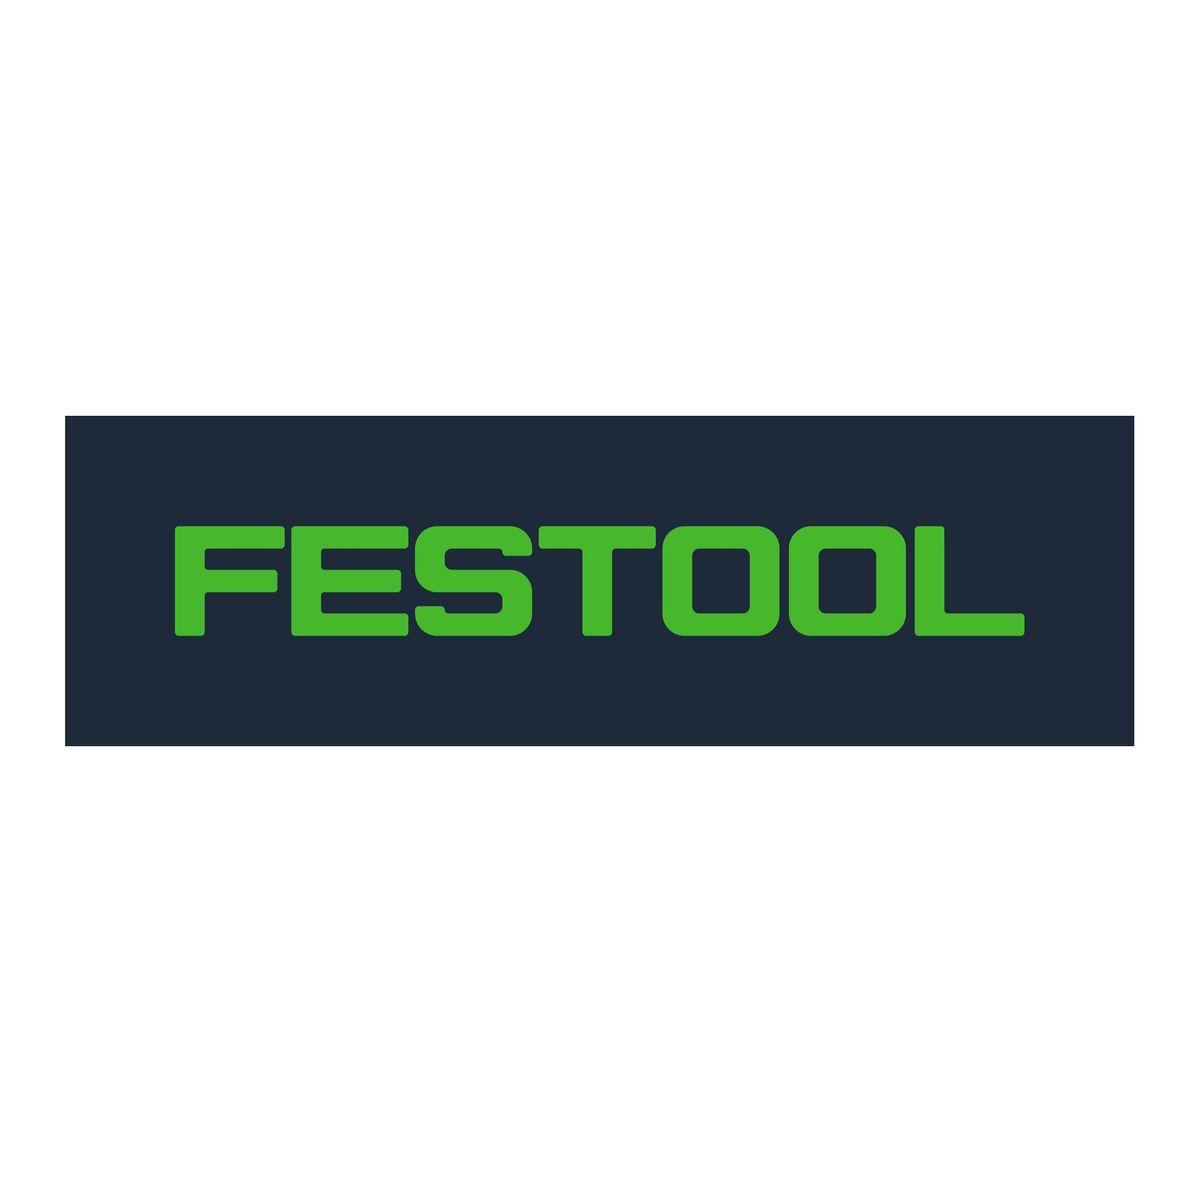 Festool Mw 1000 Basic Mobile Werkstatt Werkbank Auf Radern Inklusive Auszug Sys Az Mw 1000 203454 Dinotech E K